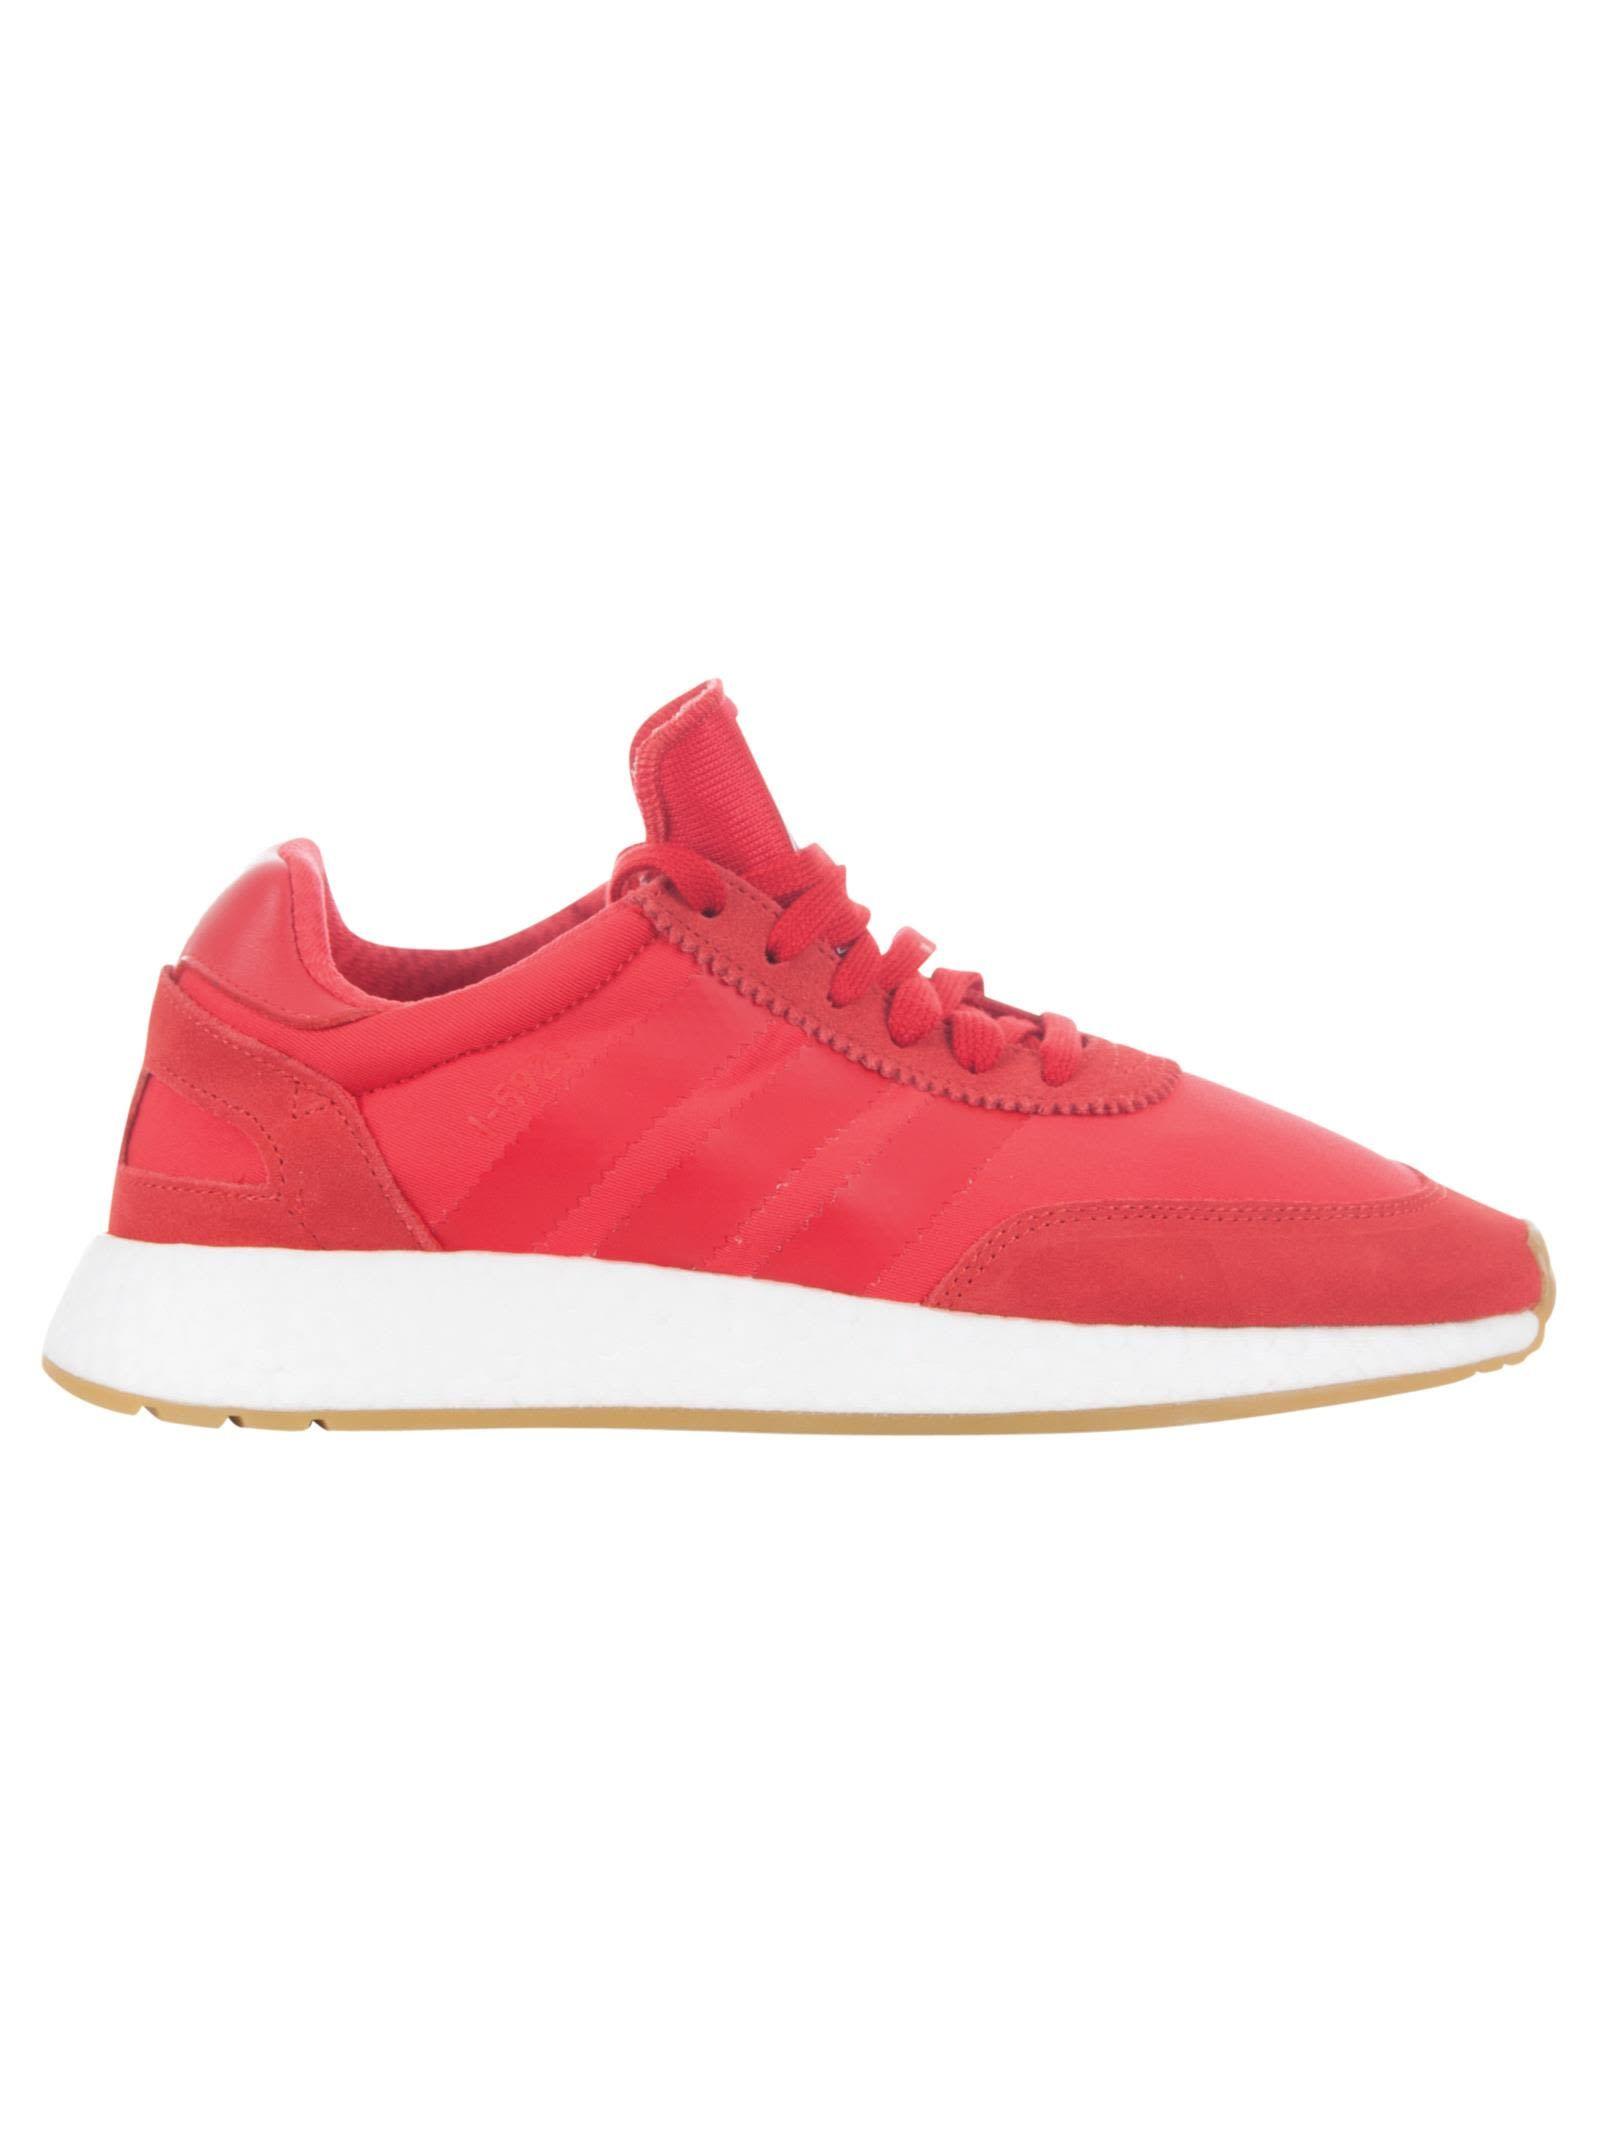 9dec2a26a83 ADIDAS ORIGINALS ORGINAL INIKI RUNNER I-5923. #adidasoriginals #shoes